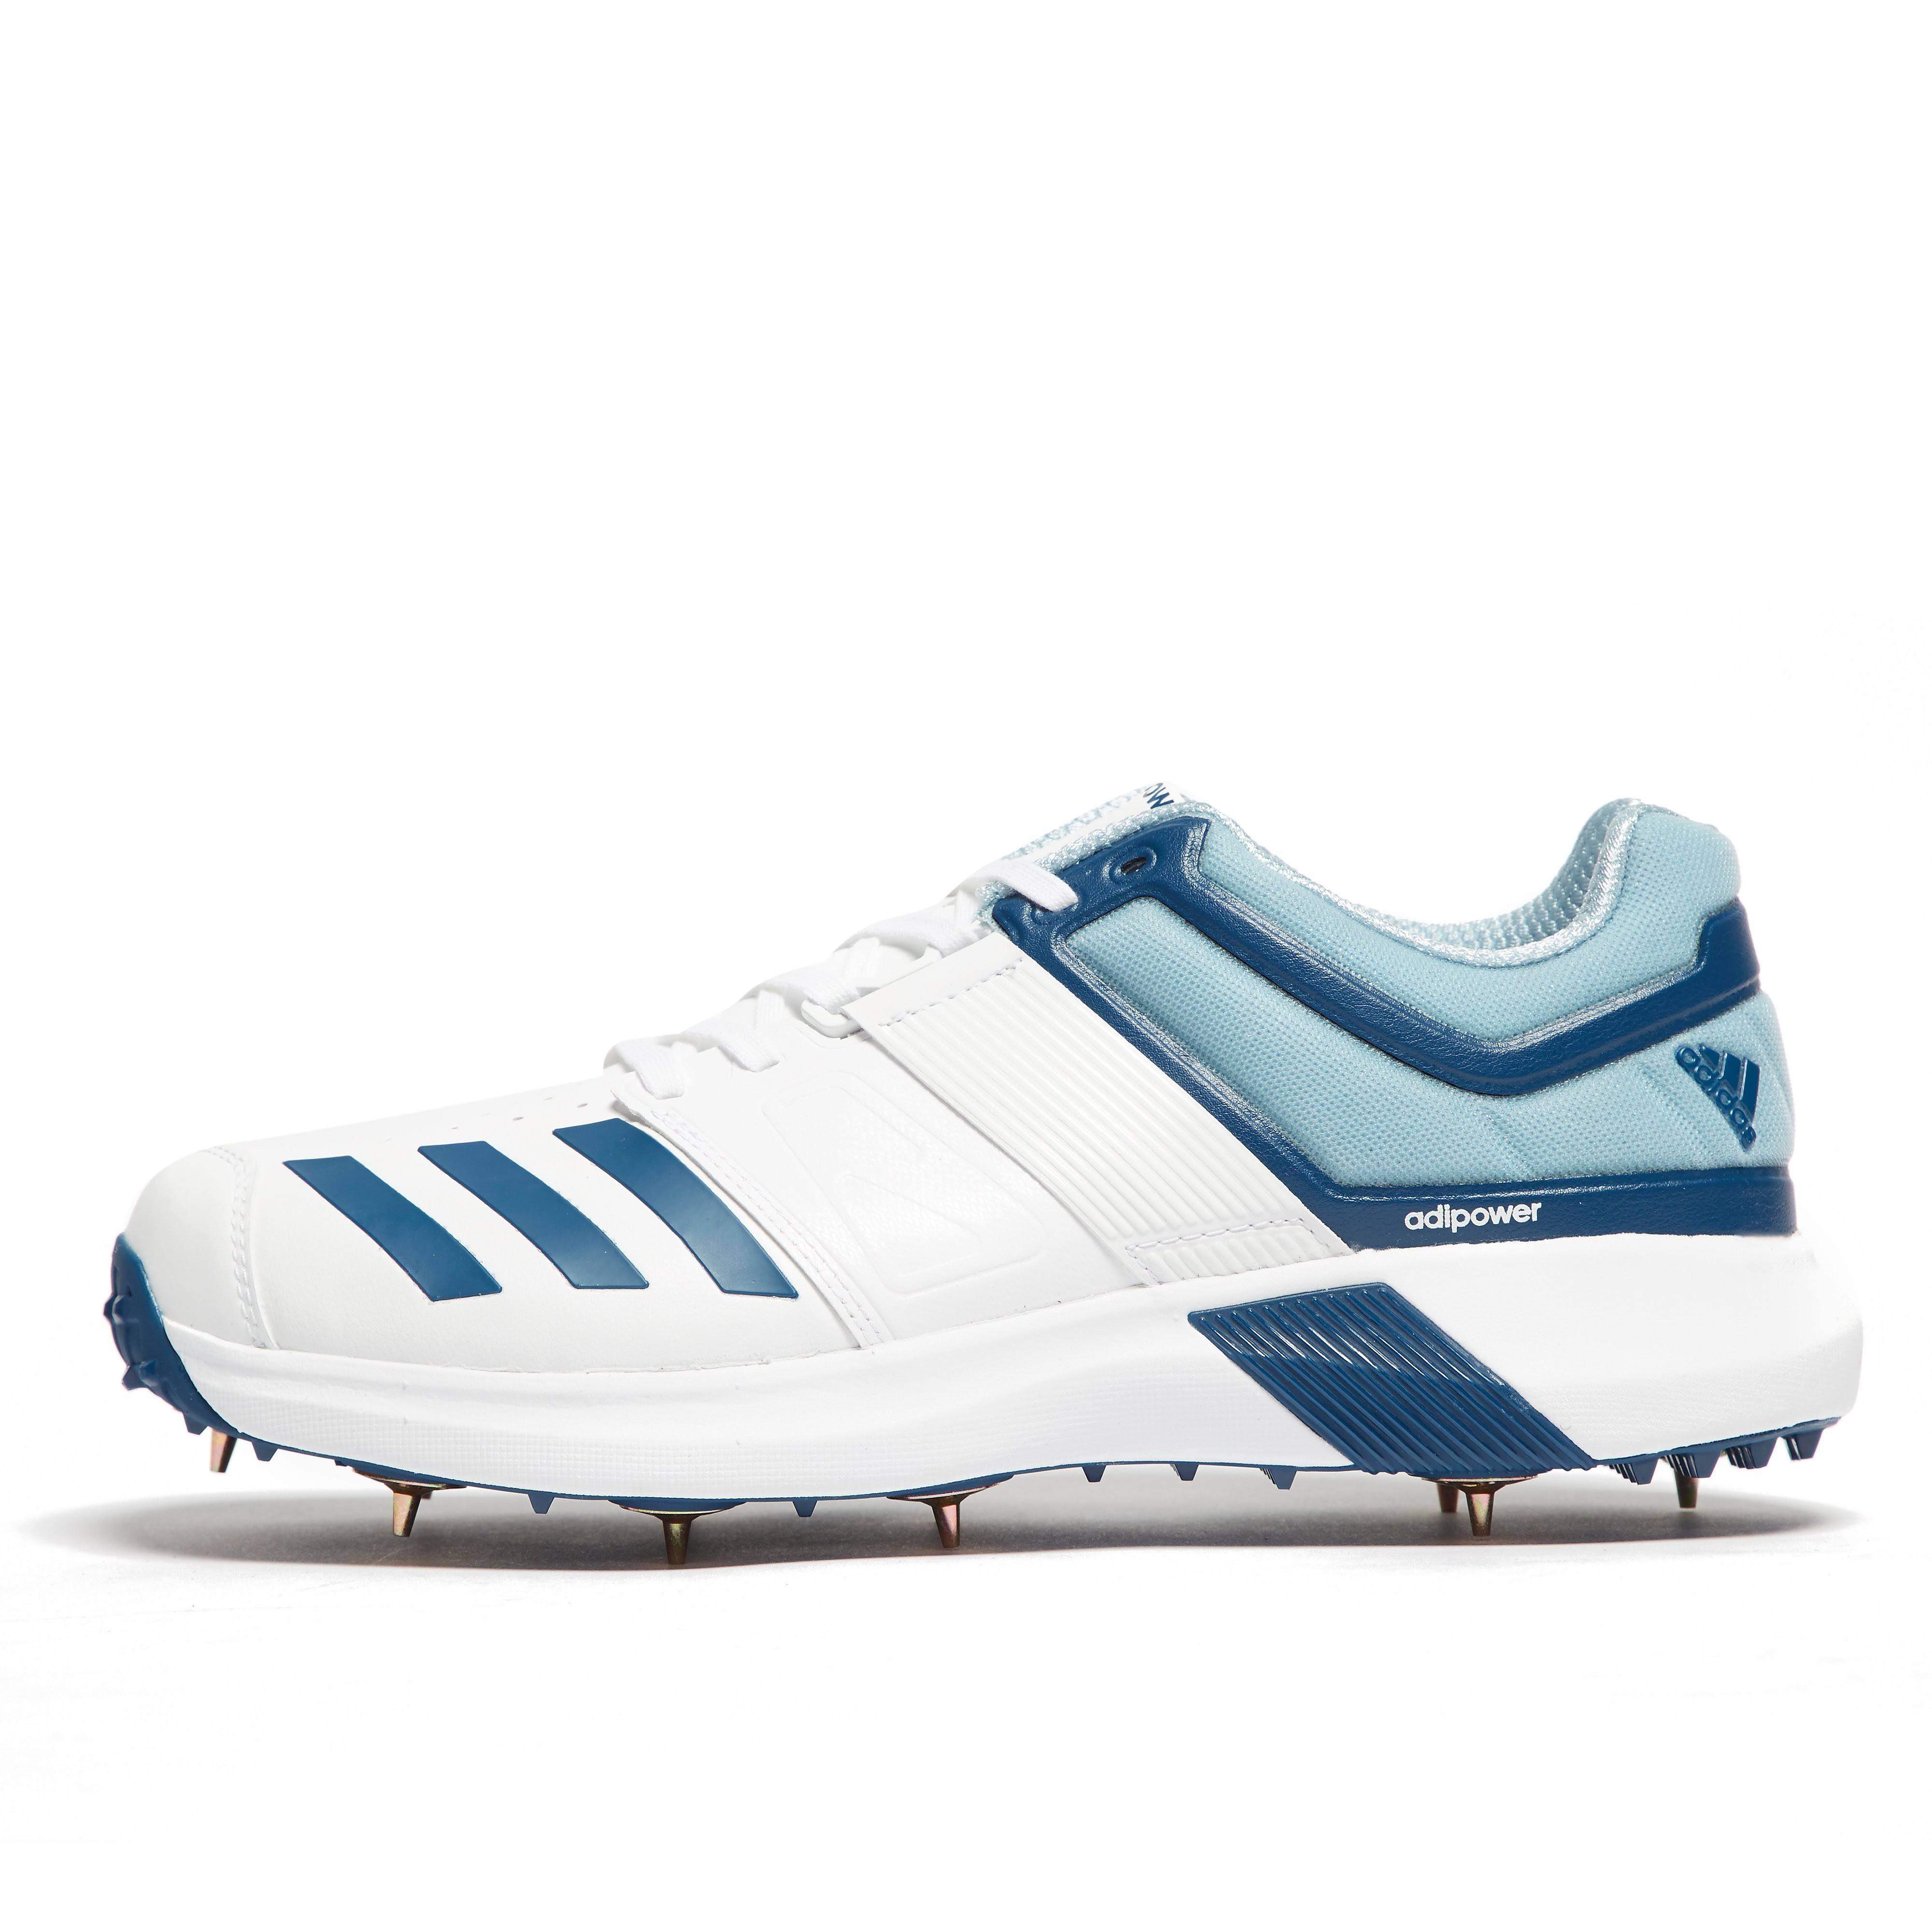 Adidas Adipower Vector Cricket Spike - UK 11